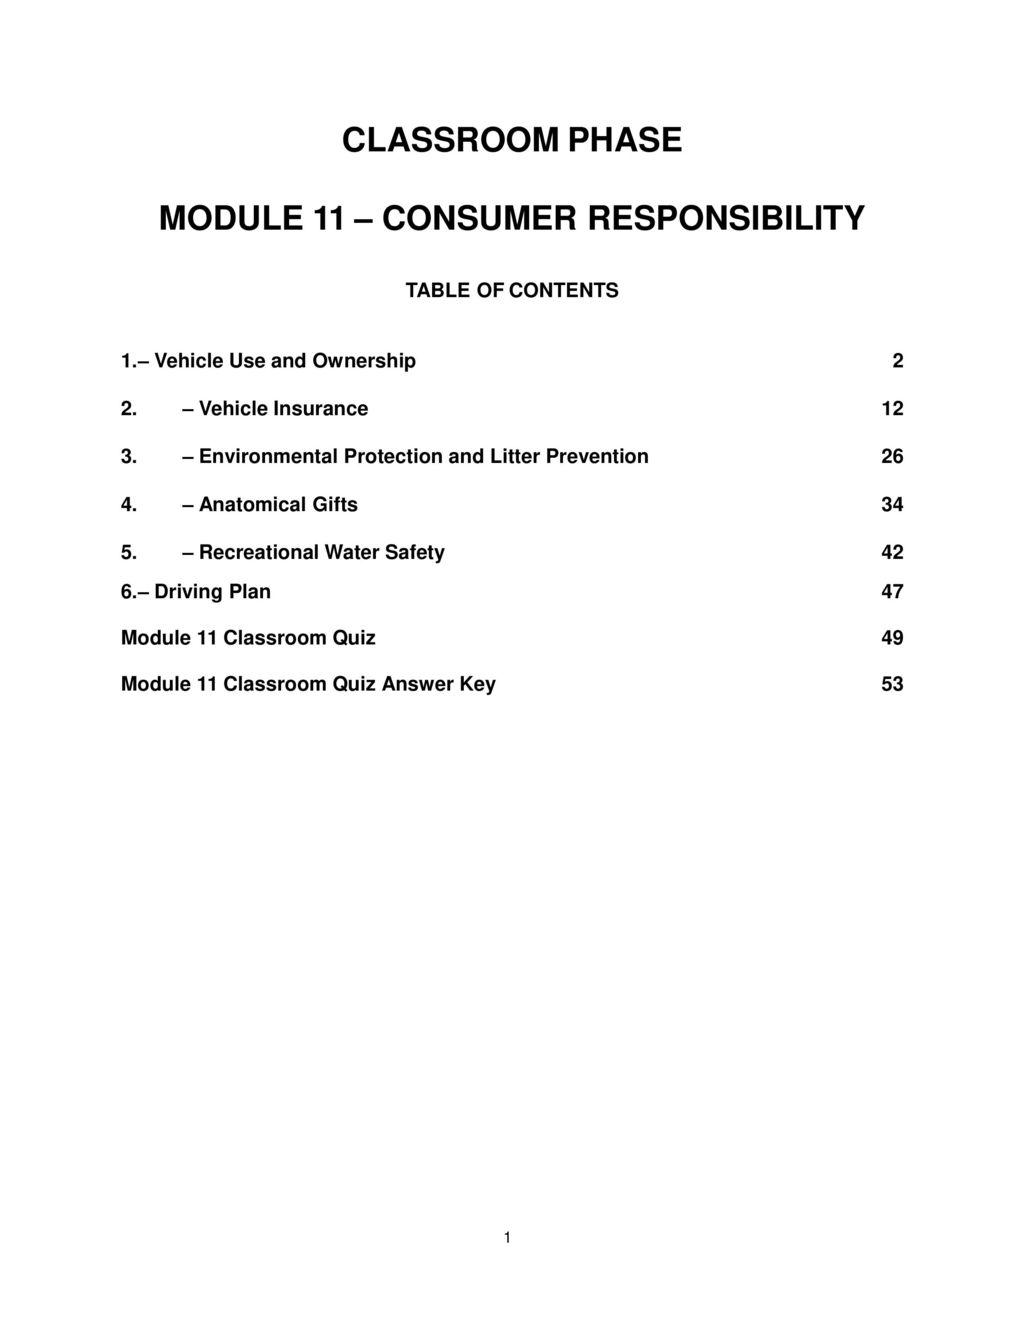 MODULE 11 – CONSUMER RESPONSIBILITY